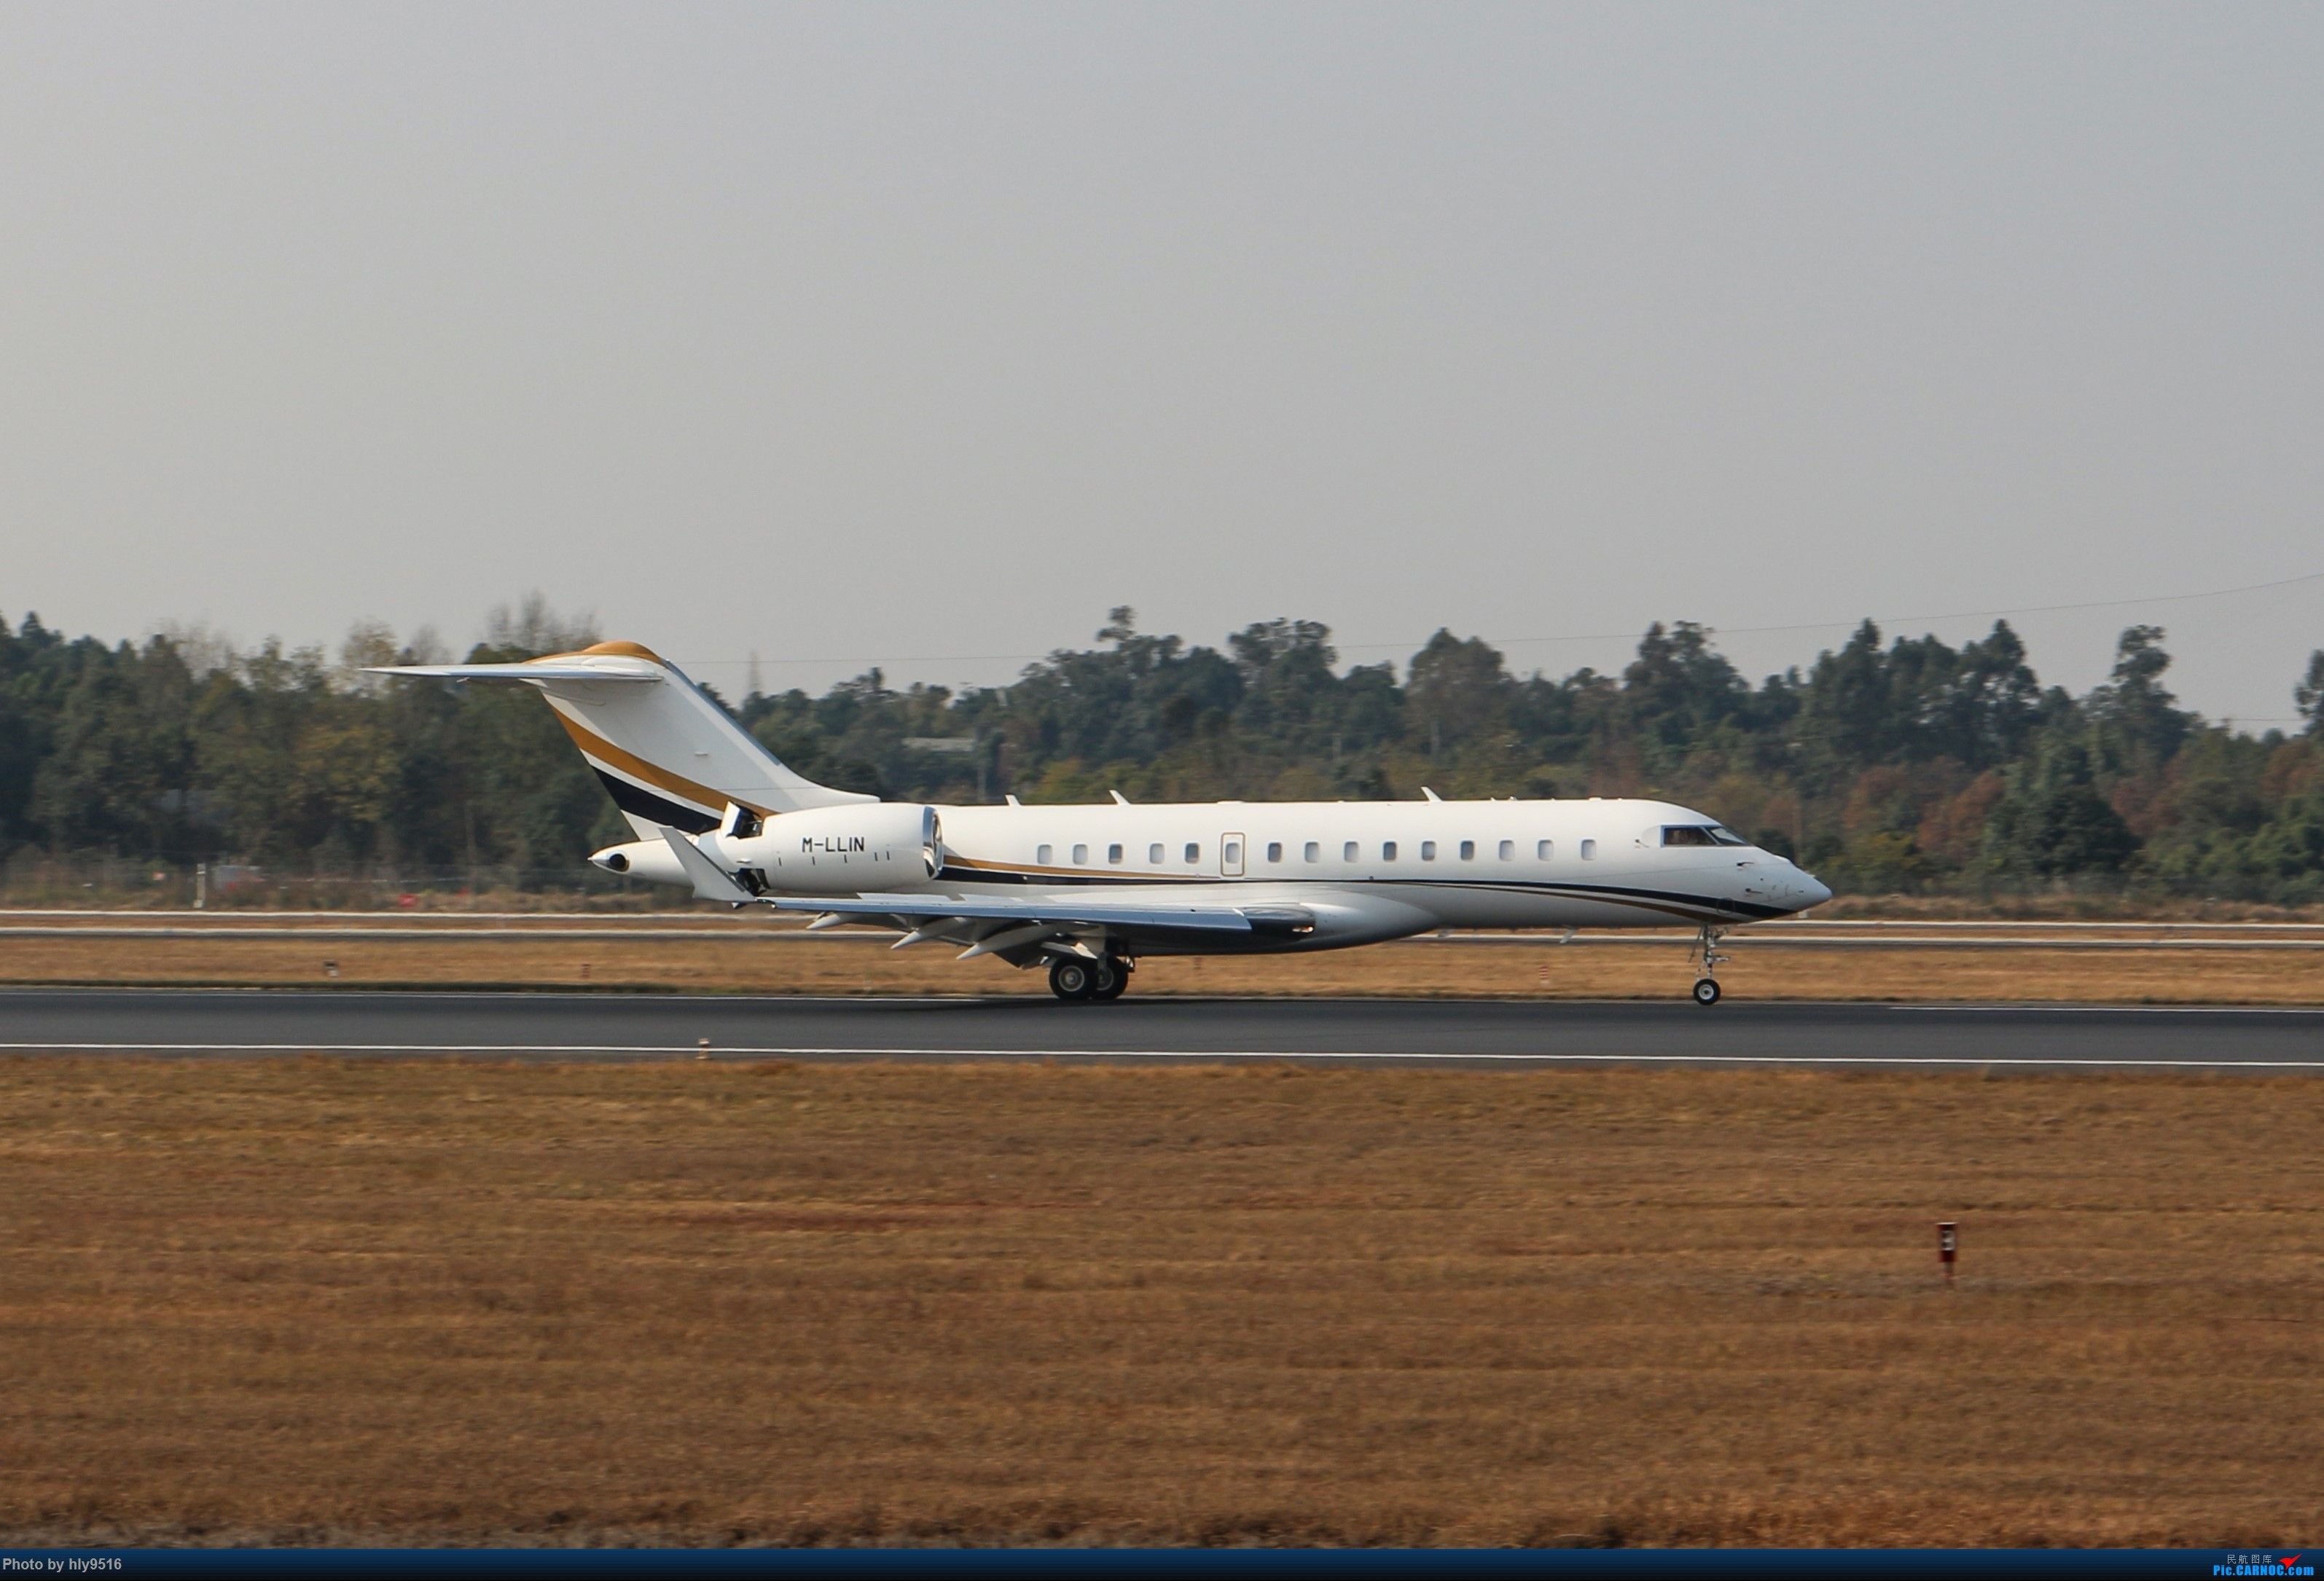 Re:[原创]【CTU】冬至拍机,近期的CTU日常 BOMBARDIER BD-700-1A10 M-LLIN 中国成都双流国际机场